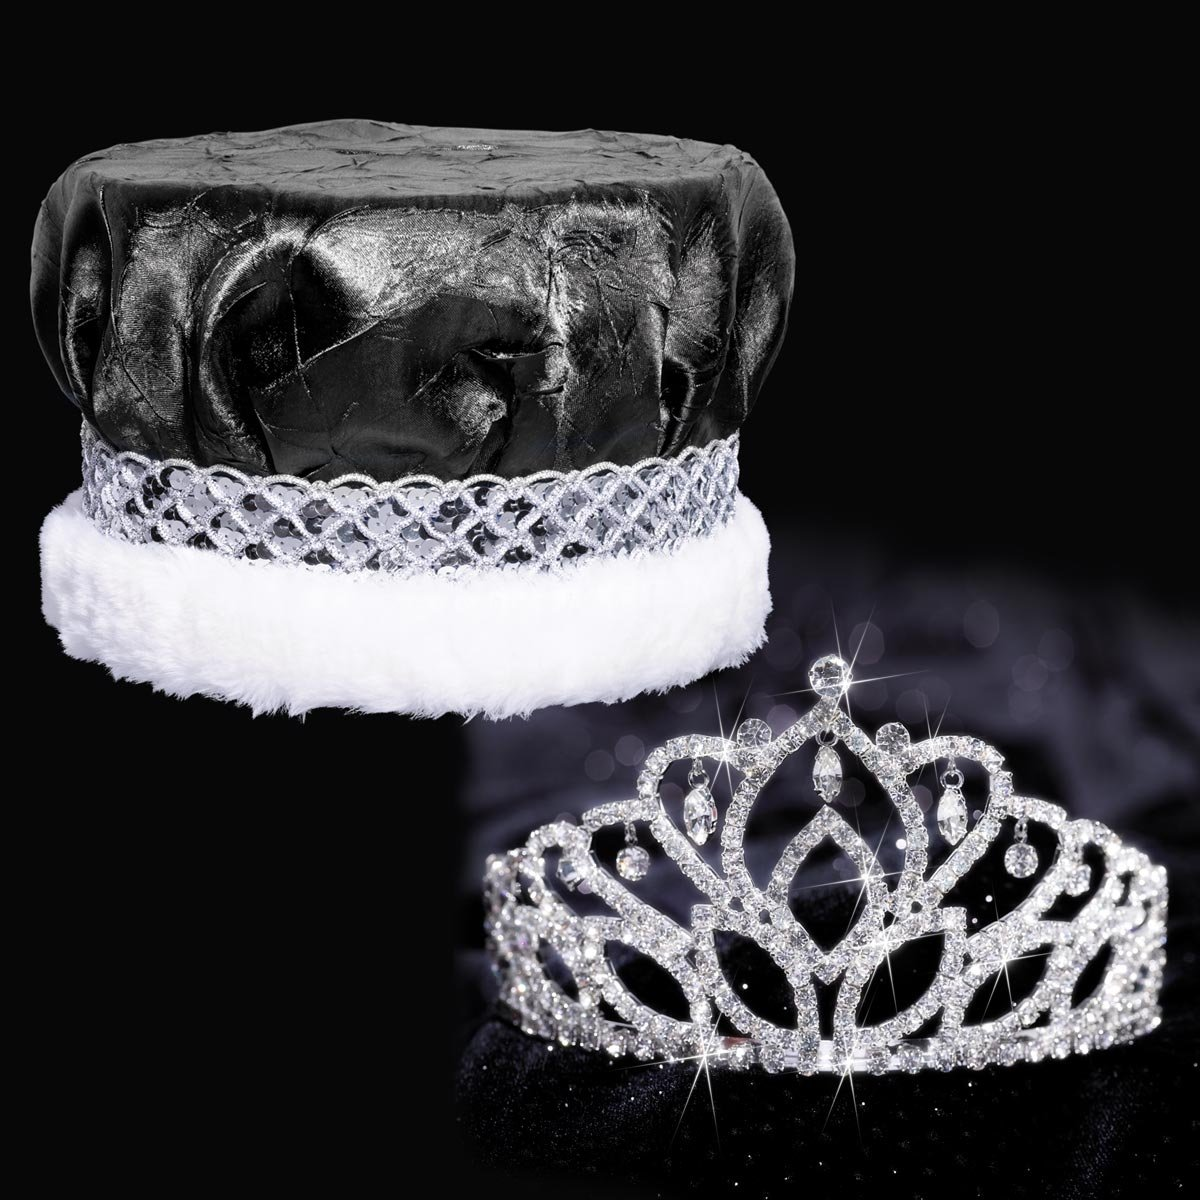 Mirabella Royalty Set, 2 7/8 inch High Mirabella Tiara and Black Crushed Satin Crown with Silver Band, White Fur